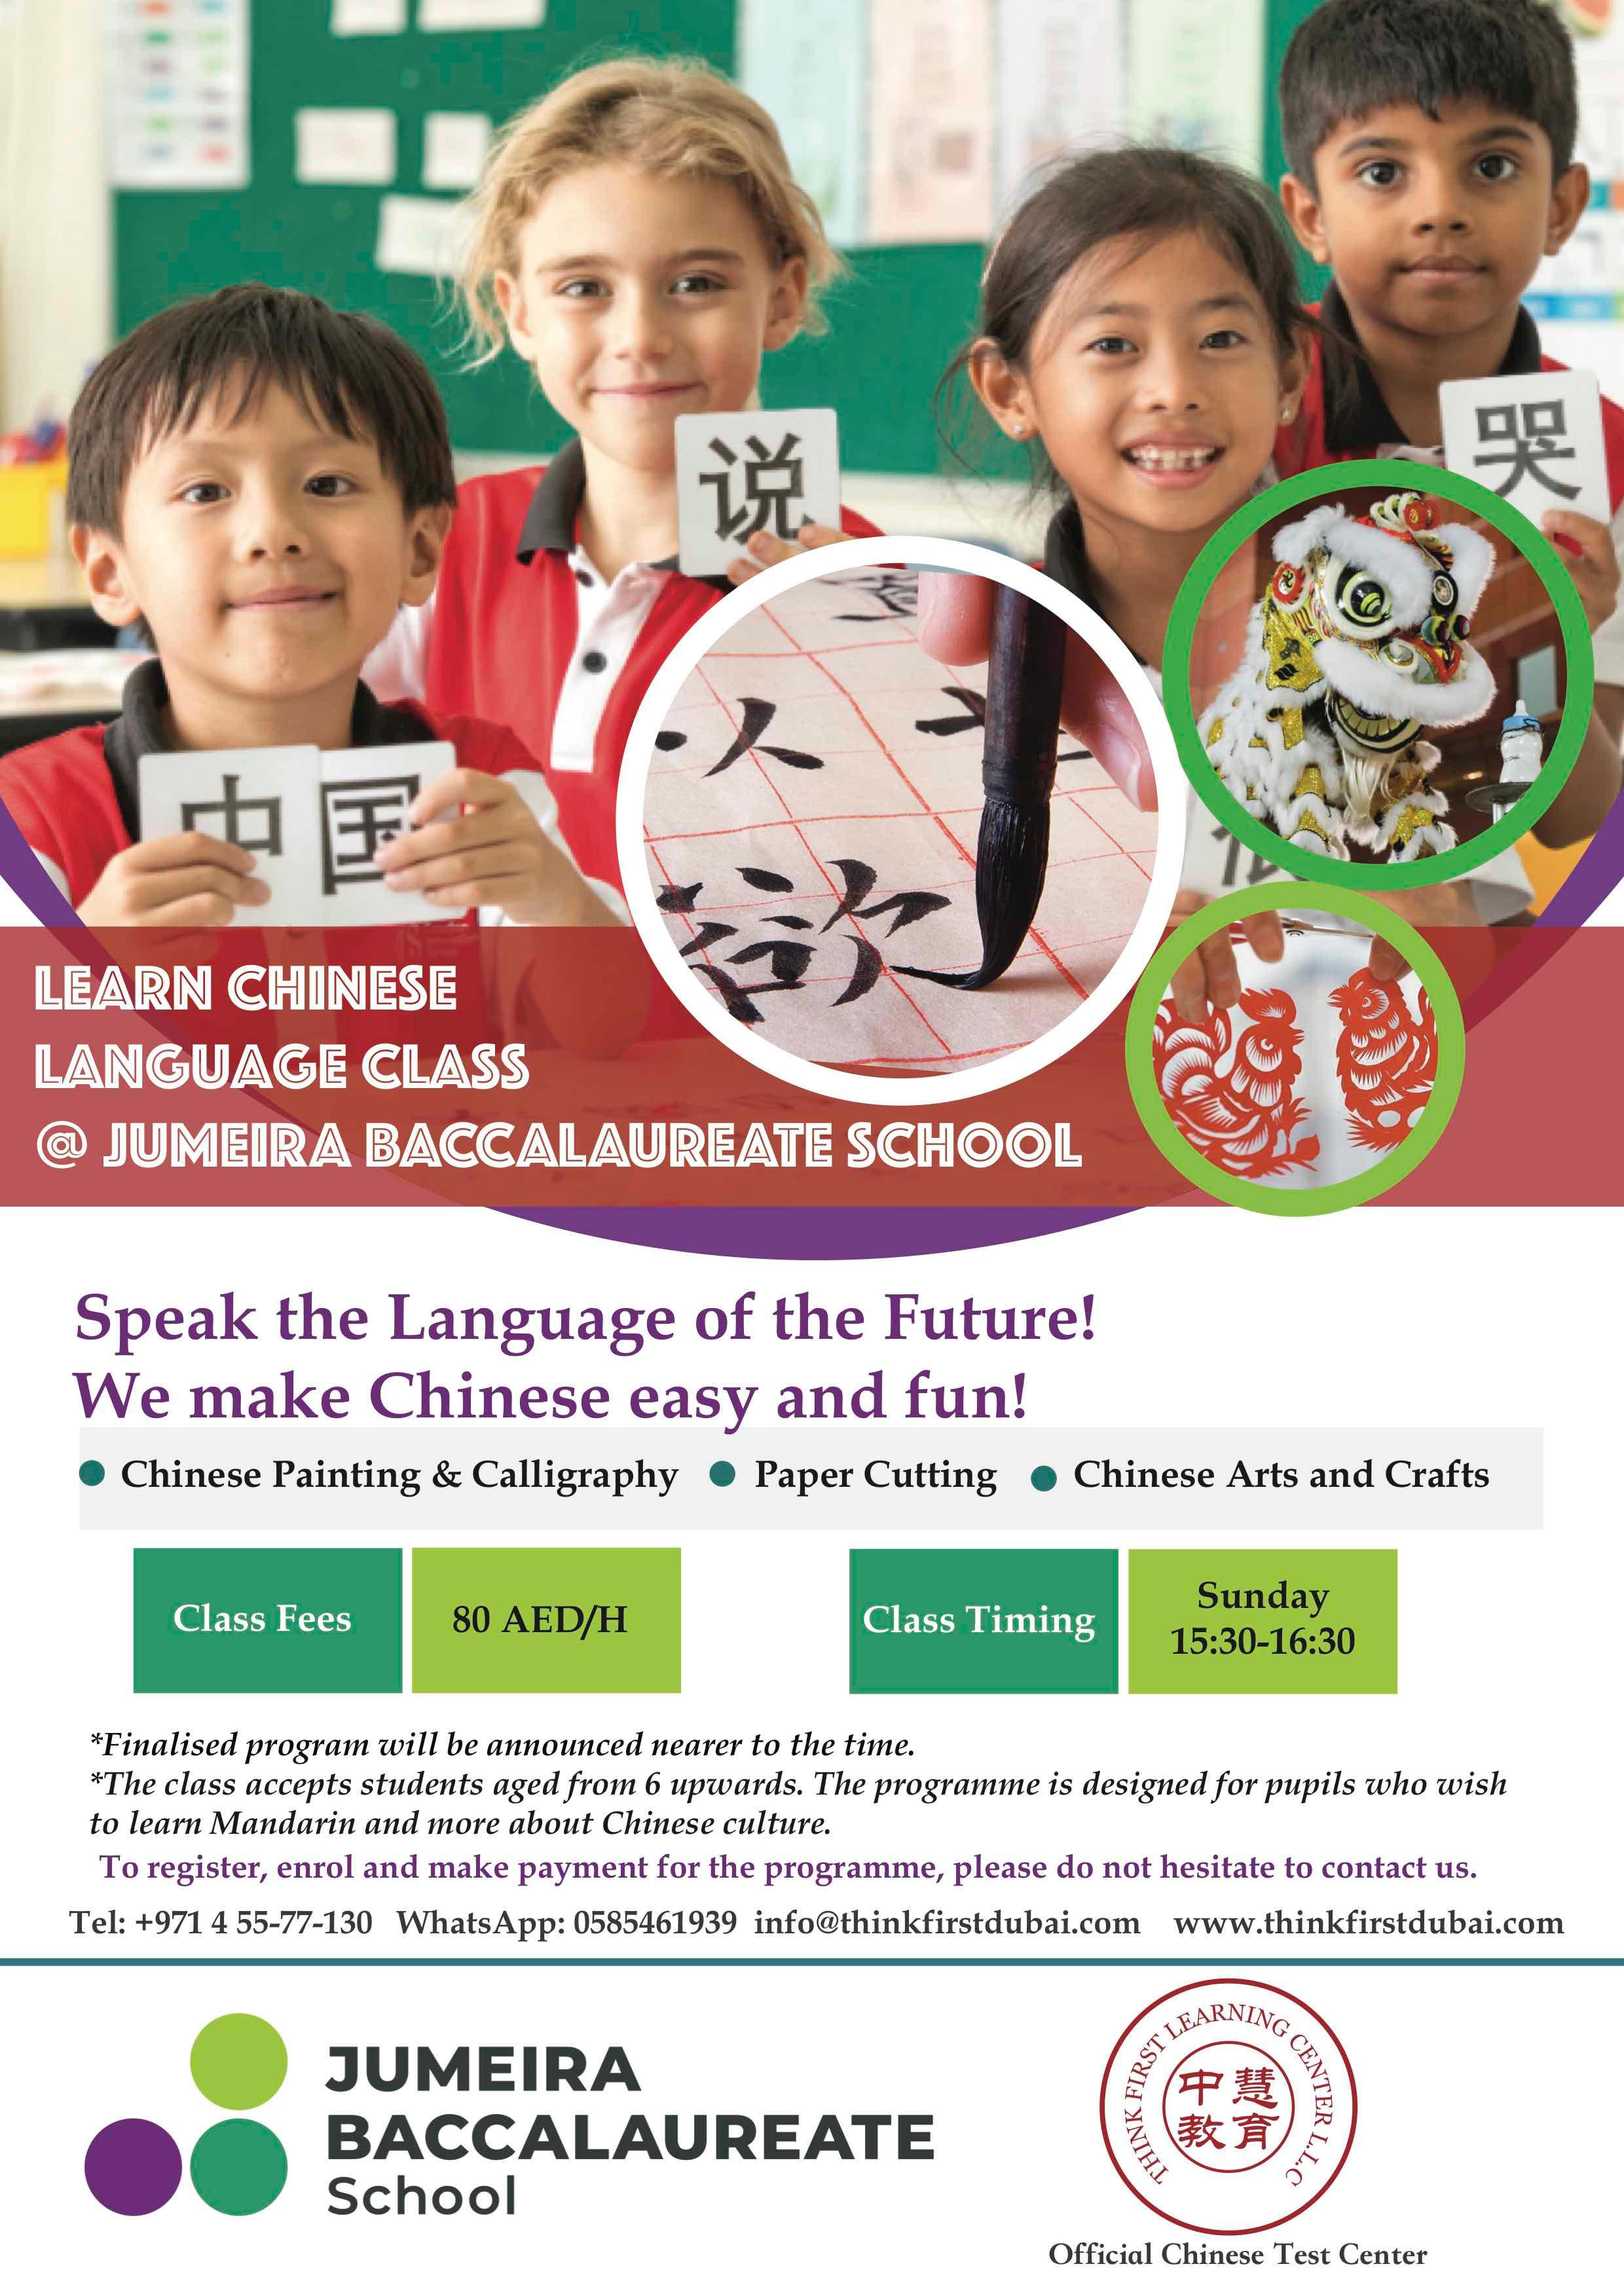 Jumeira Baccalaureate School Mandarin